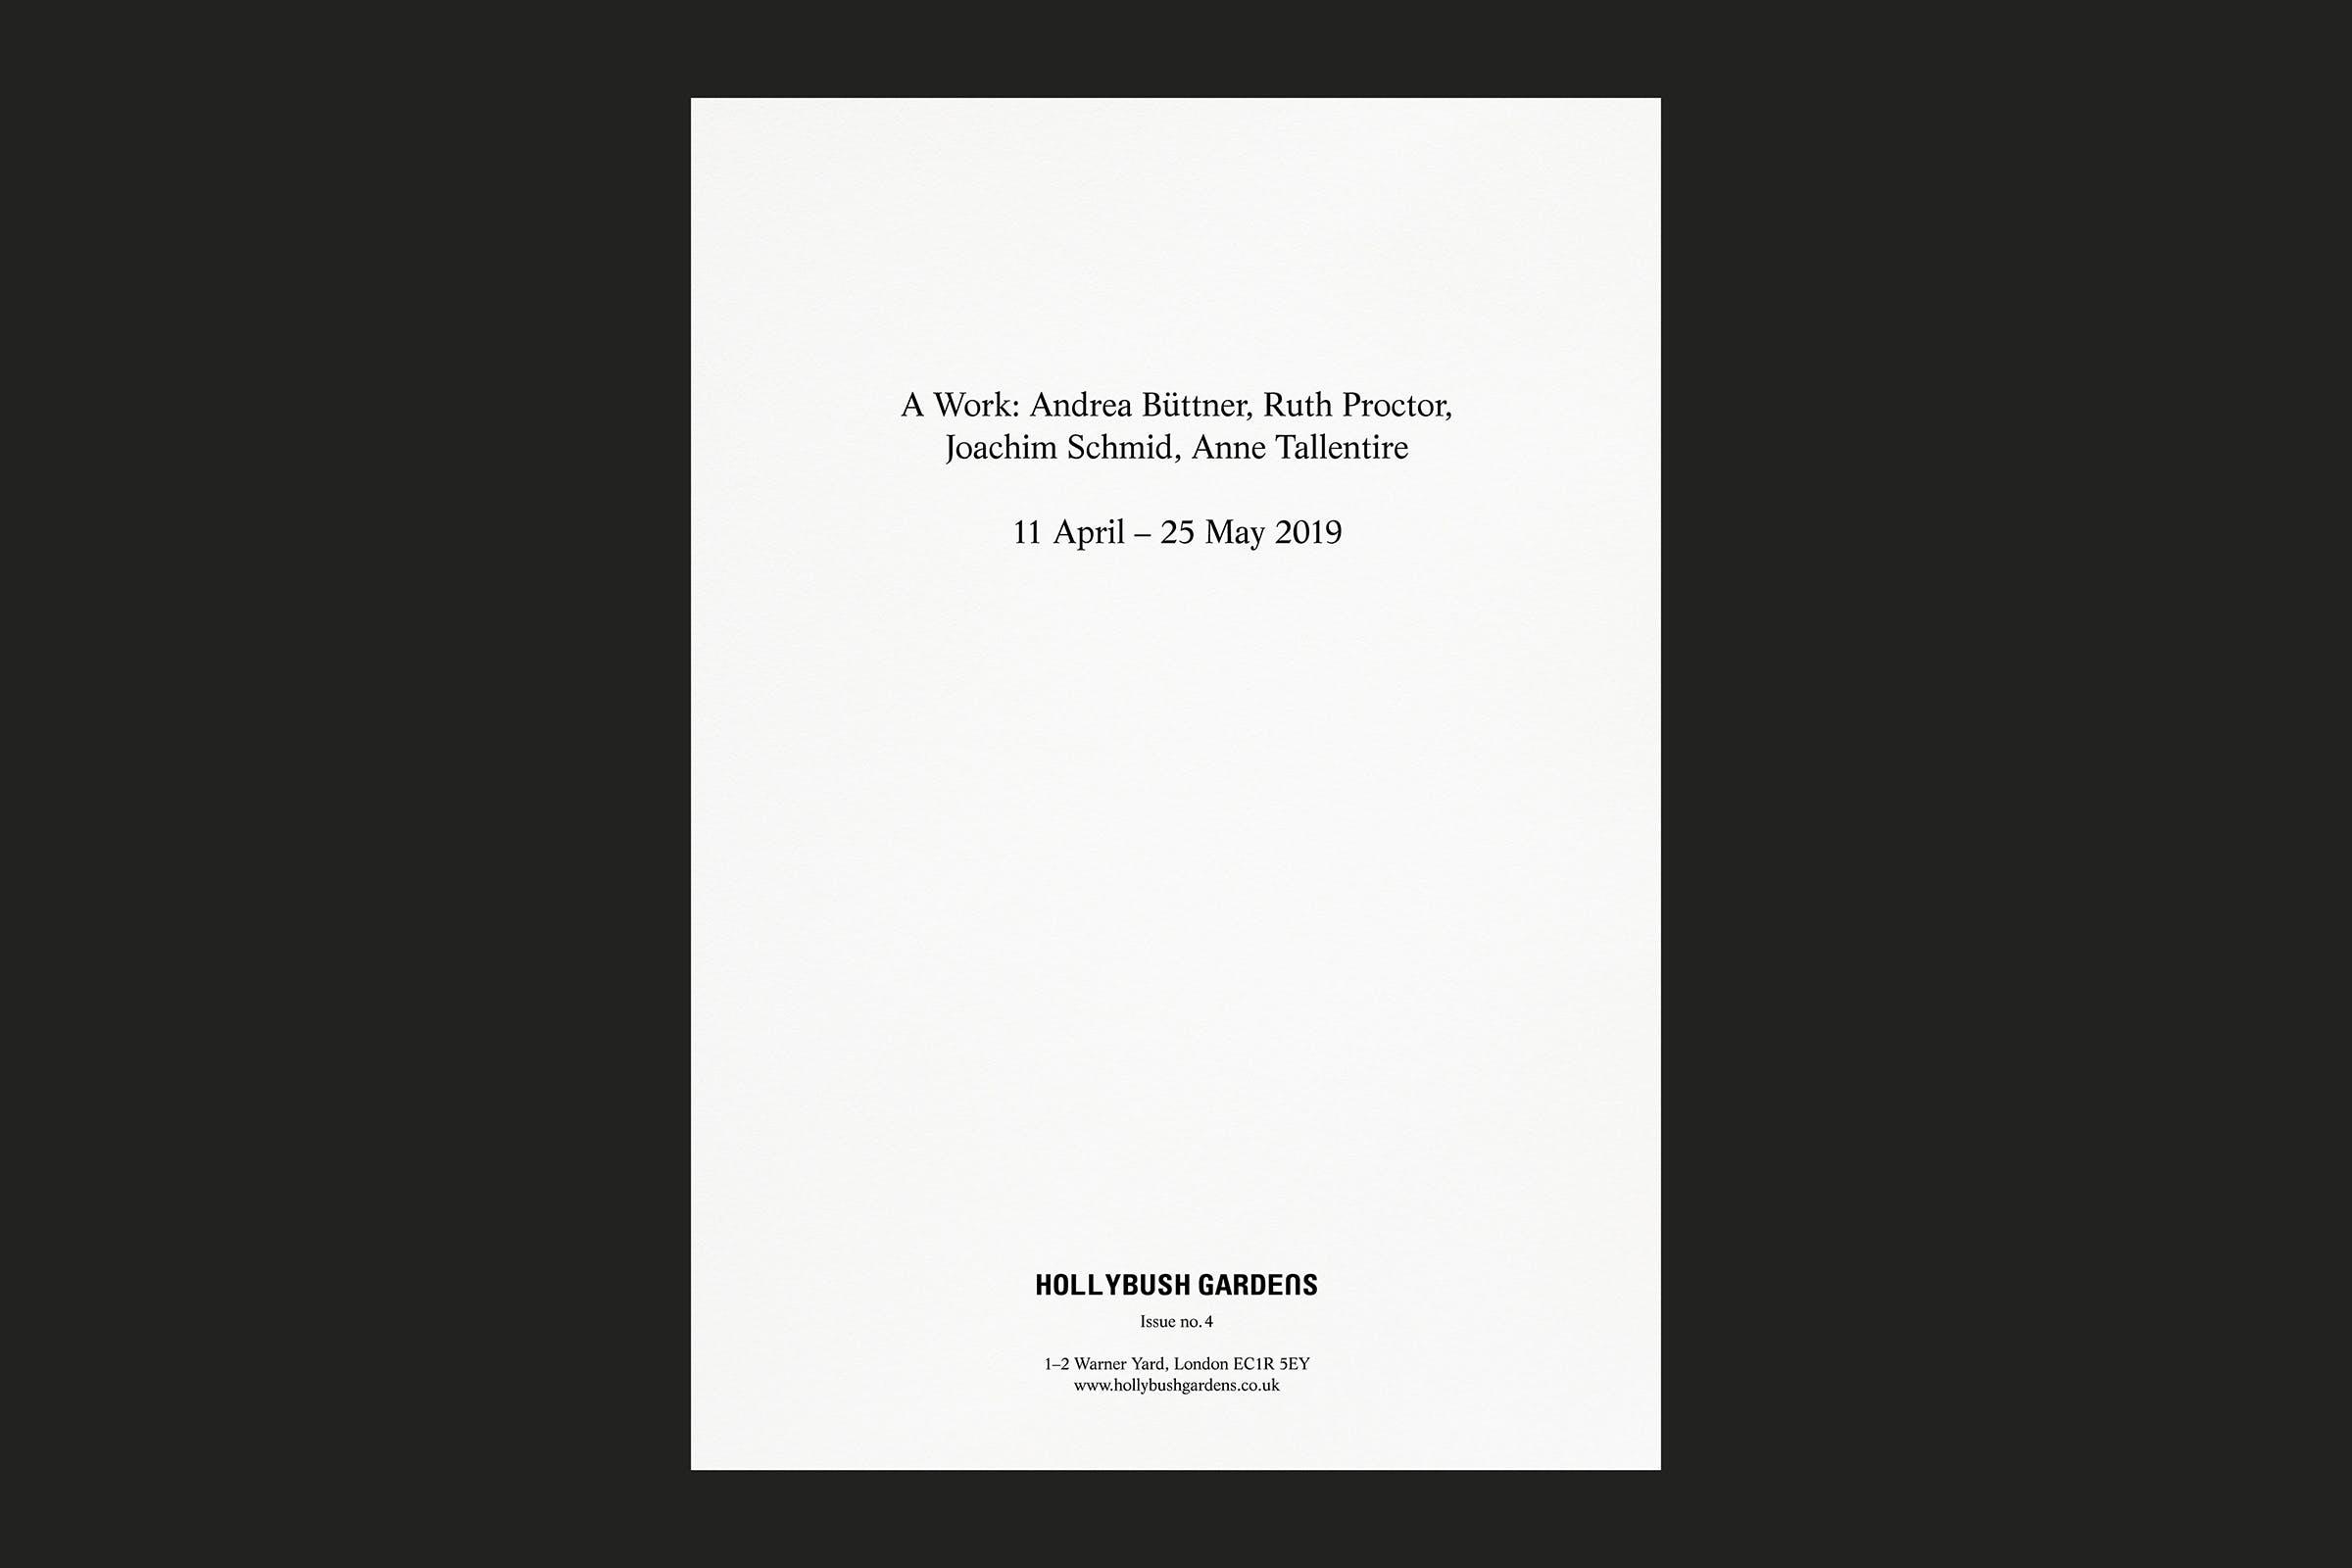 Hollybush Gardens, A Work: Andrea Büttner, Ruth Proctor, Joachim Schmid, Anne Tallentire, Graphic Design by Wolfe Hall